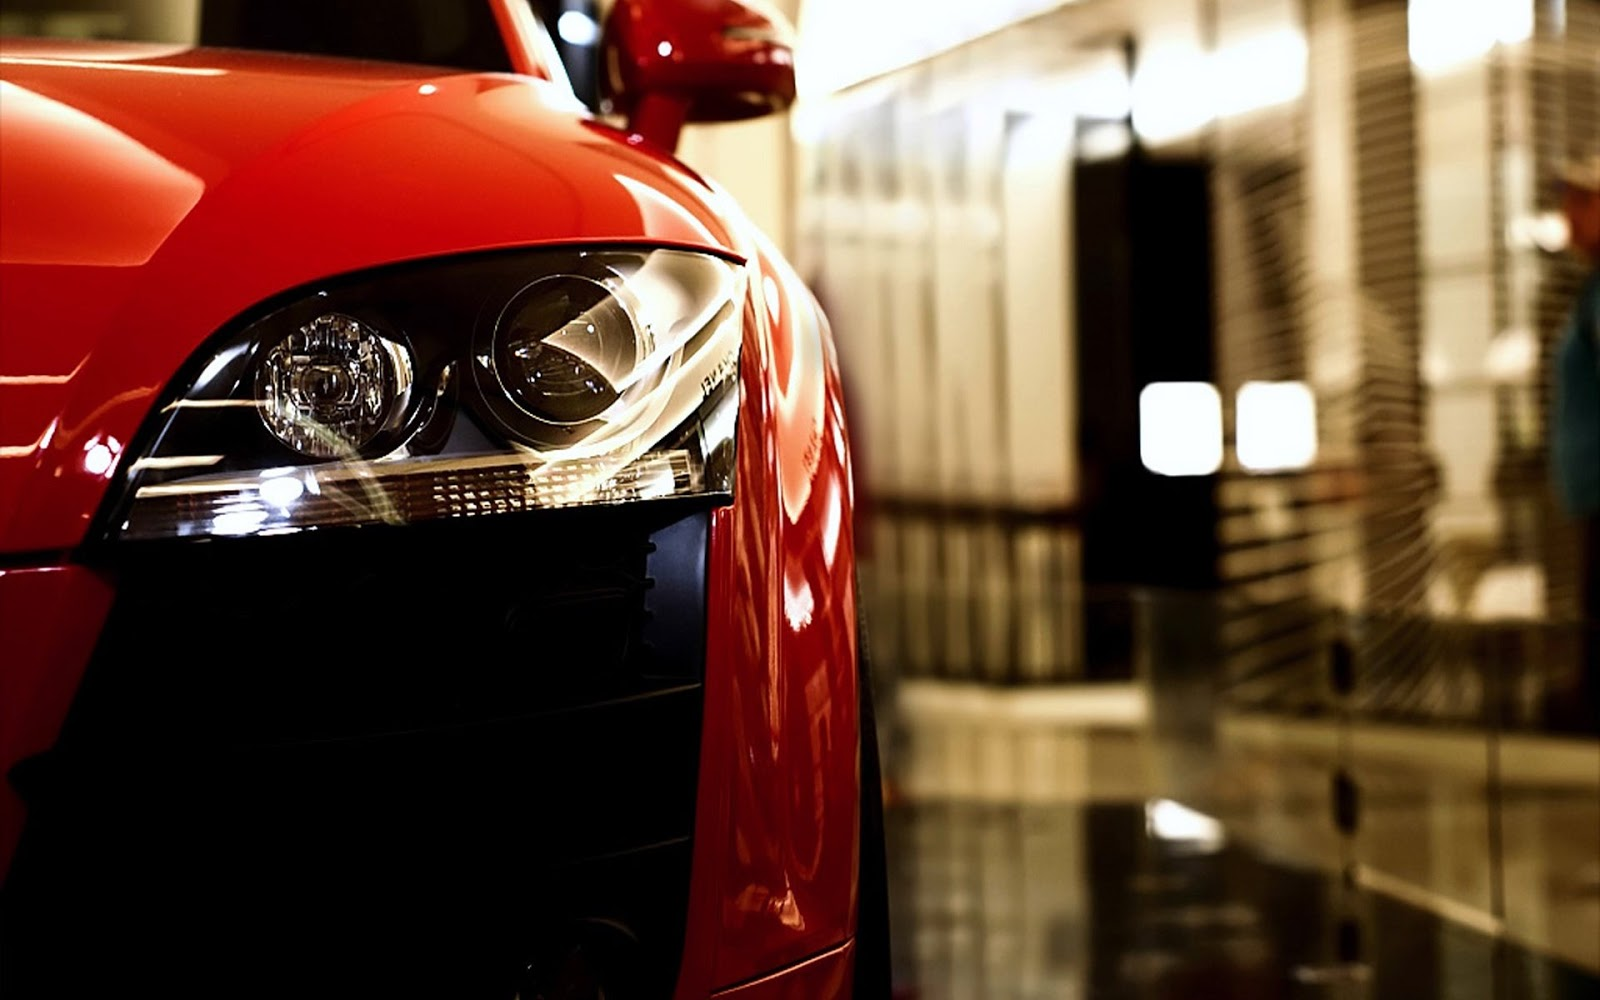 Red Audi TT Head Lamp